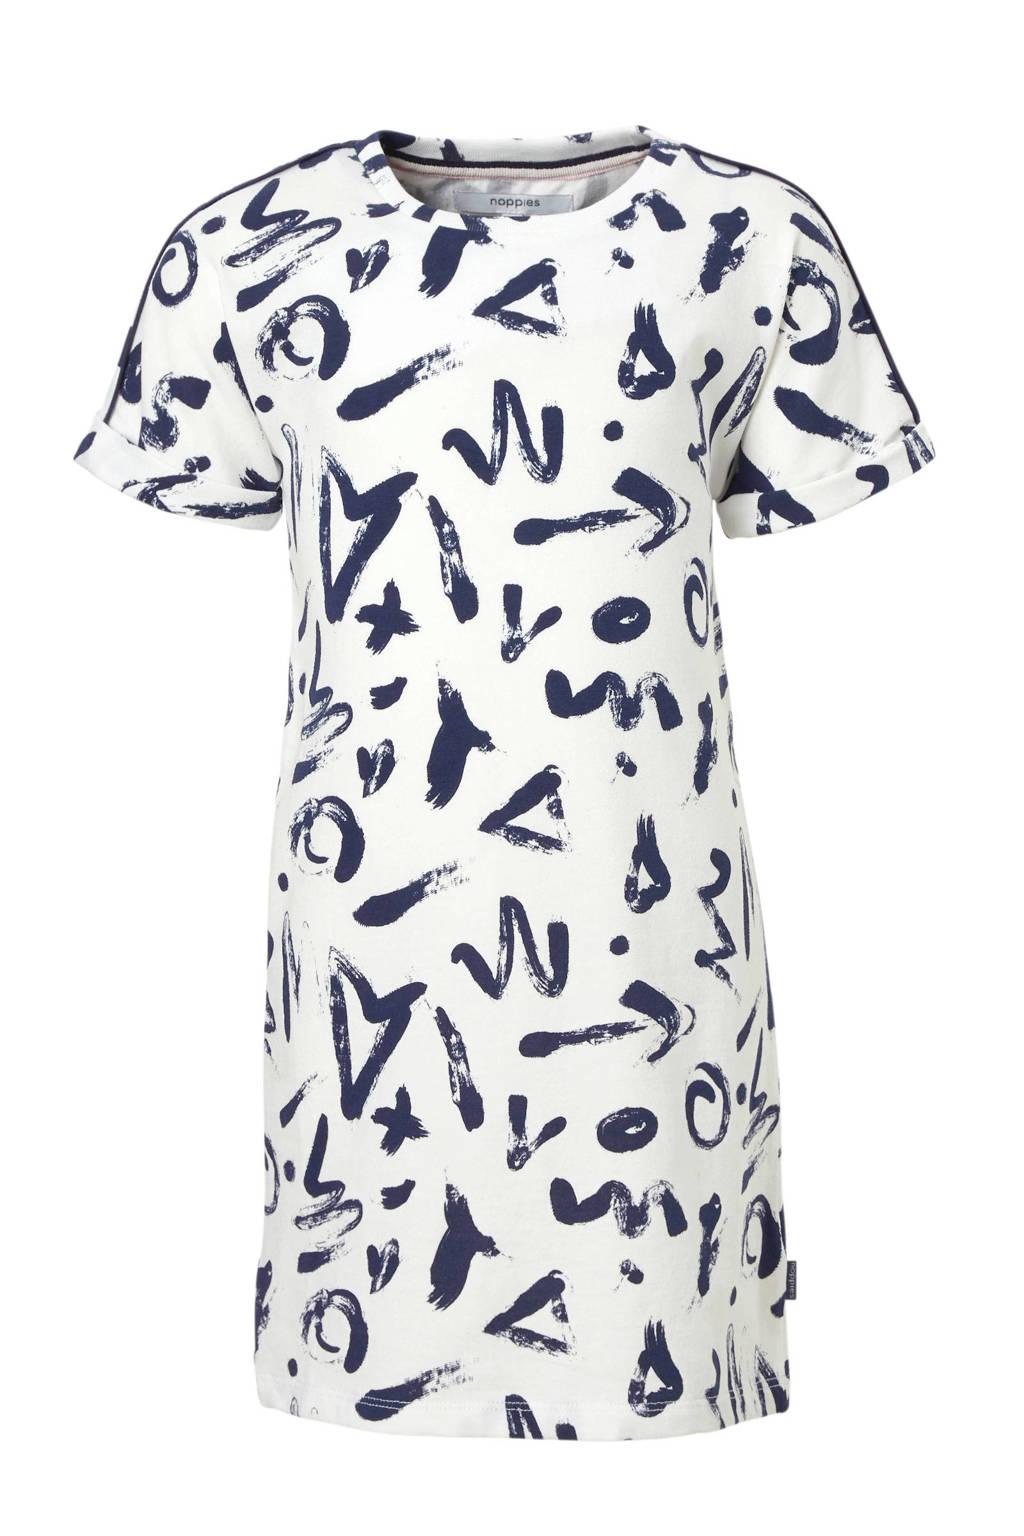 Noppies jurk met allover print, Wit/ blauw